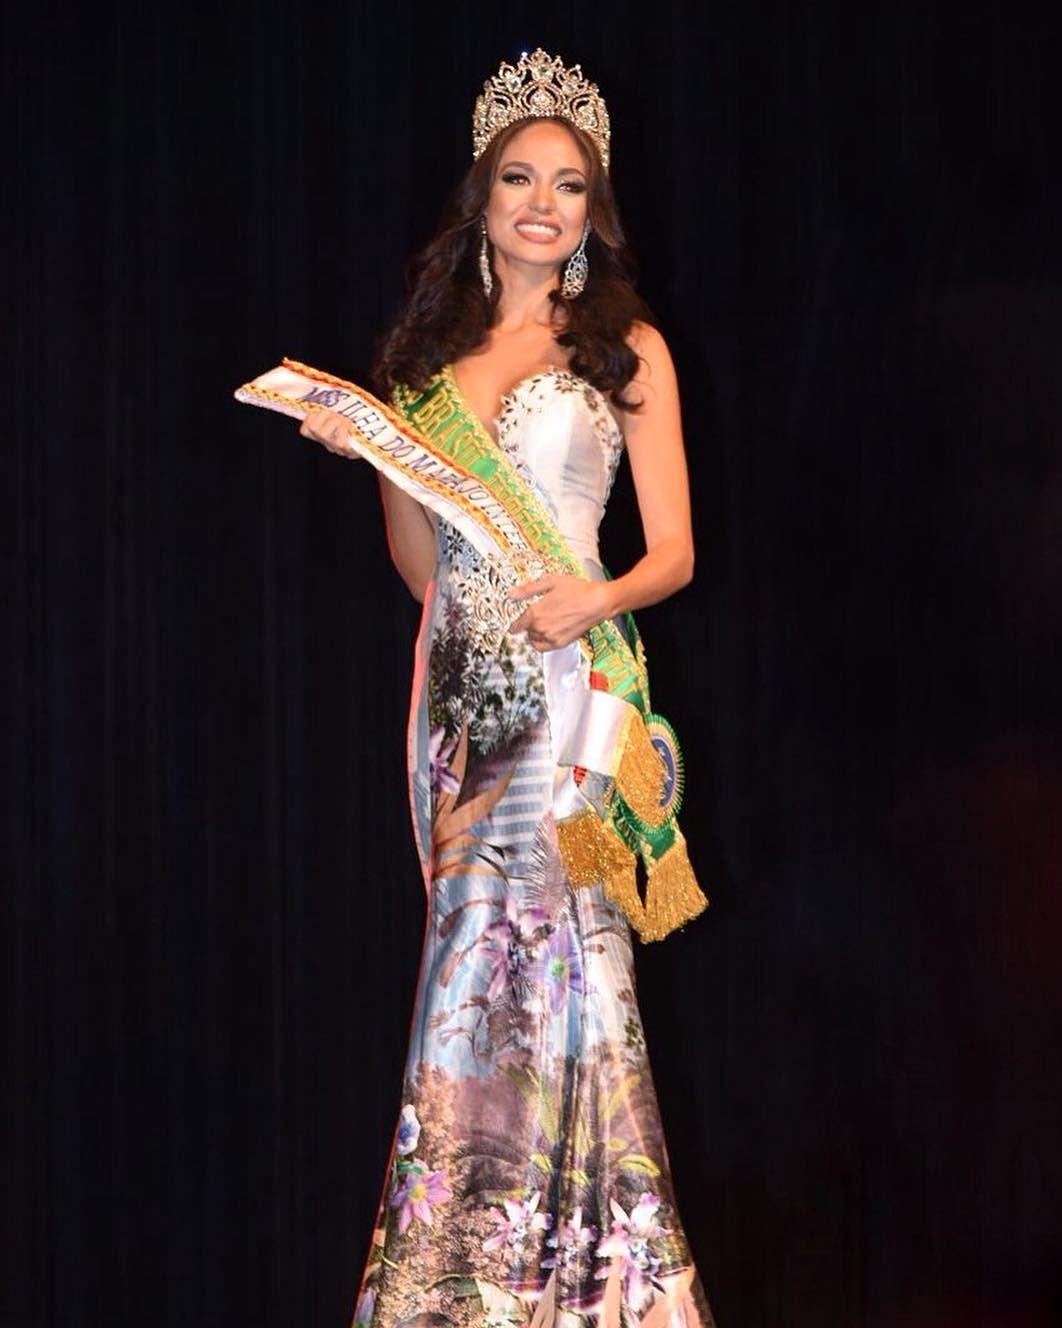 miss brasil intercontinental 2016: sabrina sancler. - Página 5 9tgvf9e4